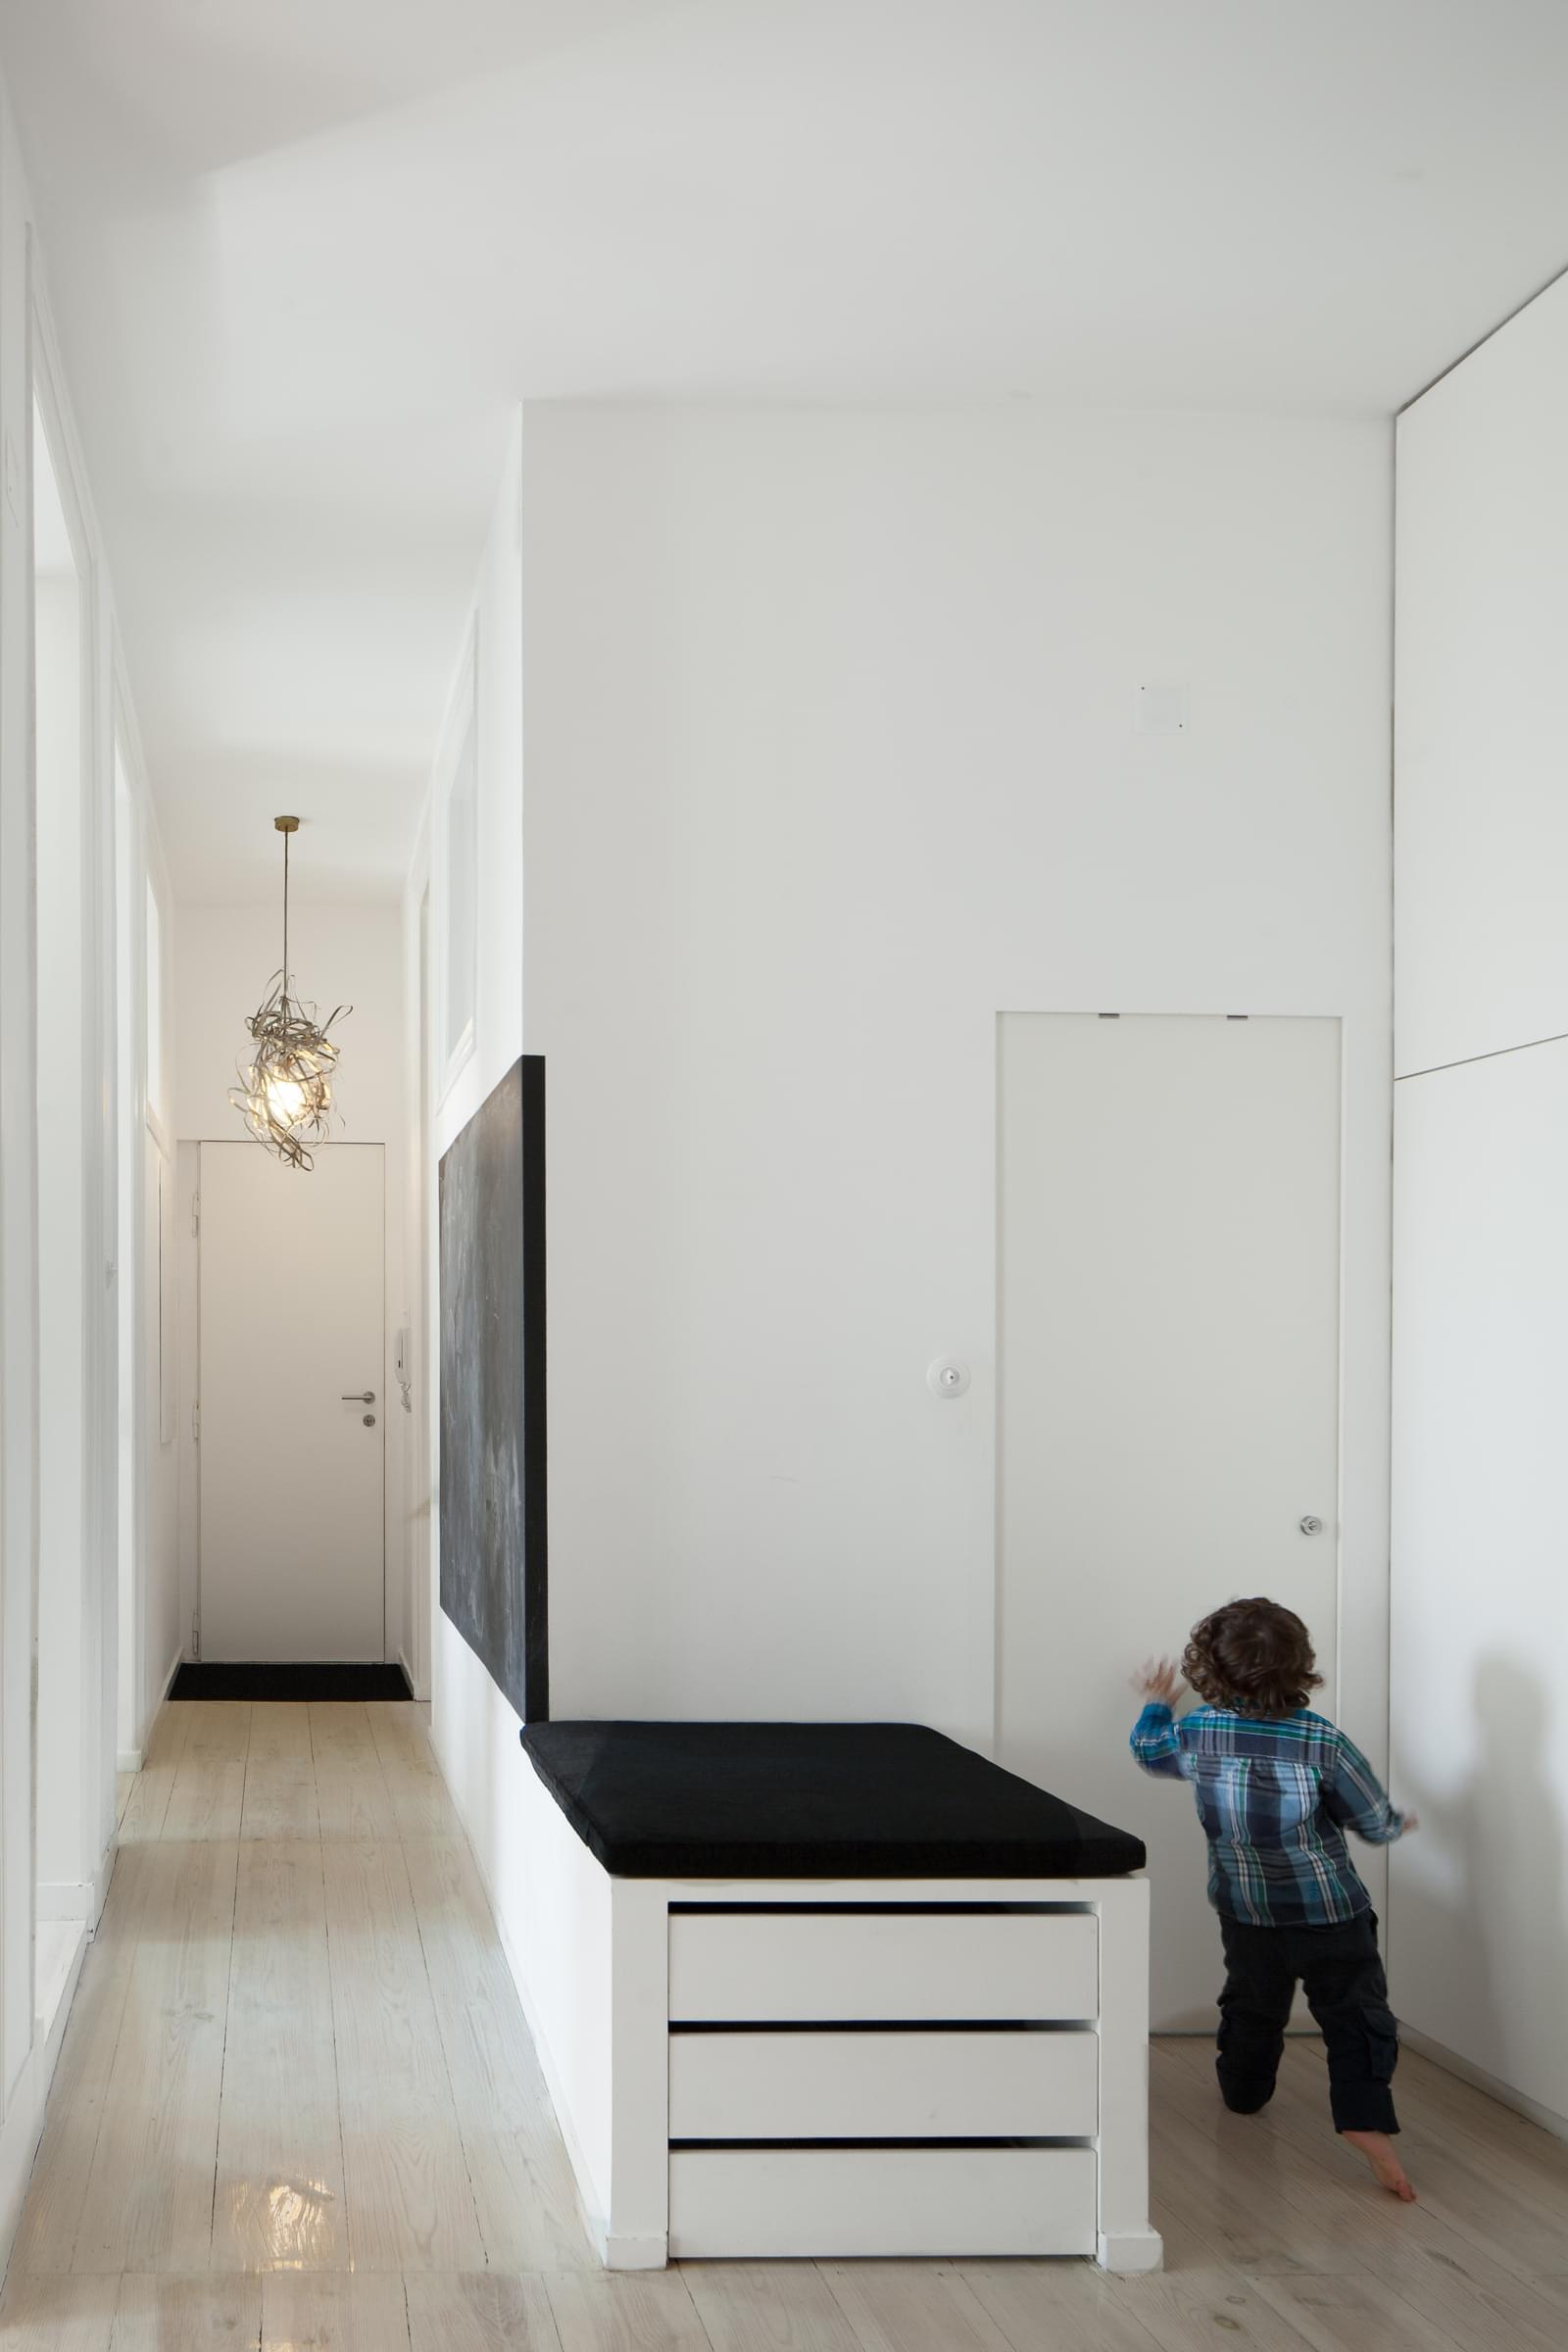 pf17588-apartamento-t4-1-lisboa-301b9ad5-3e2f-4e7d-9d53-5d9fa95b49e9